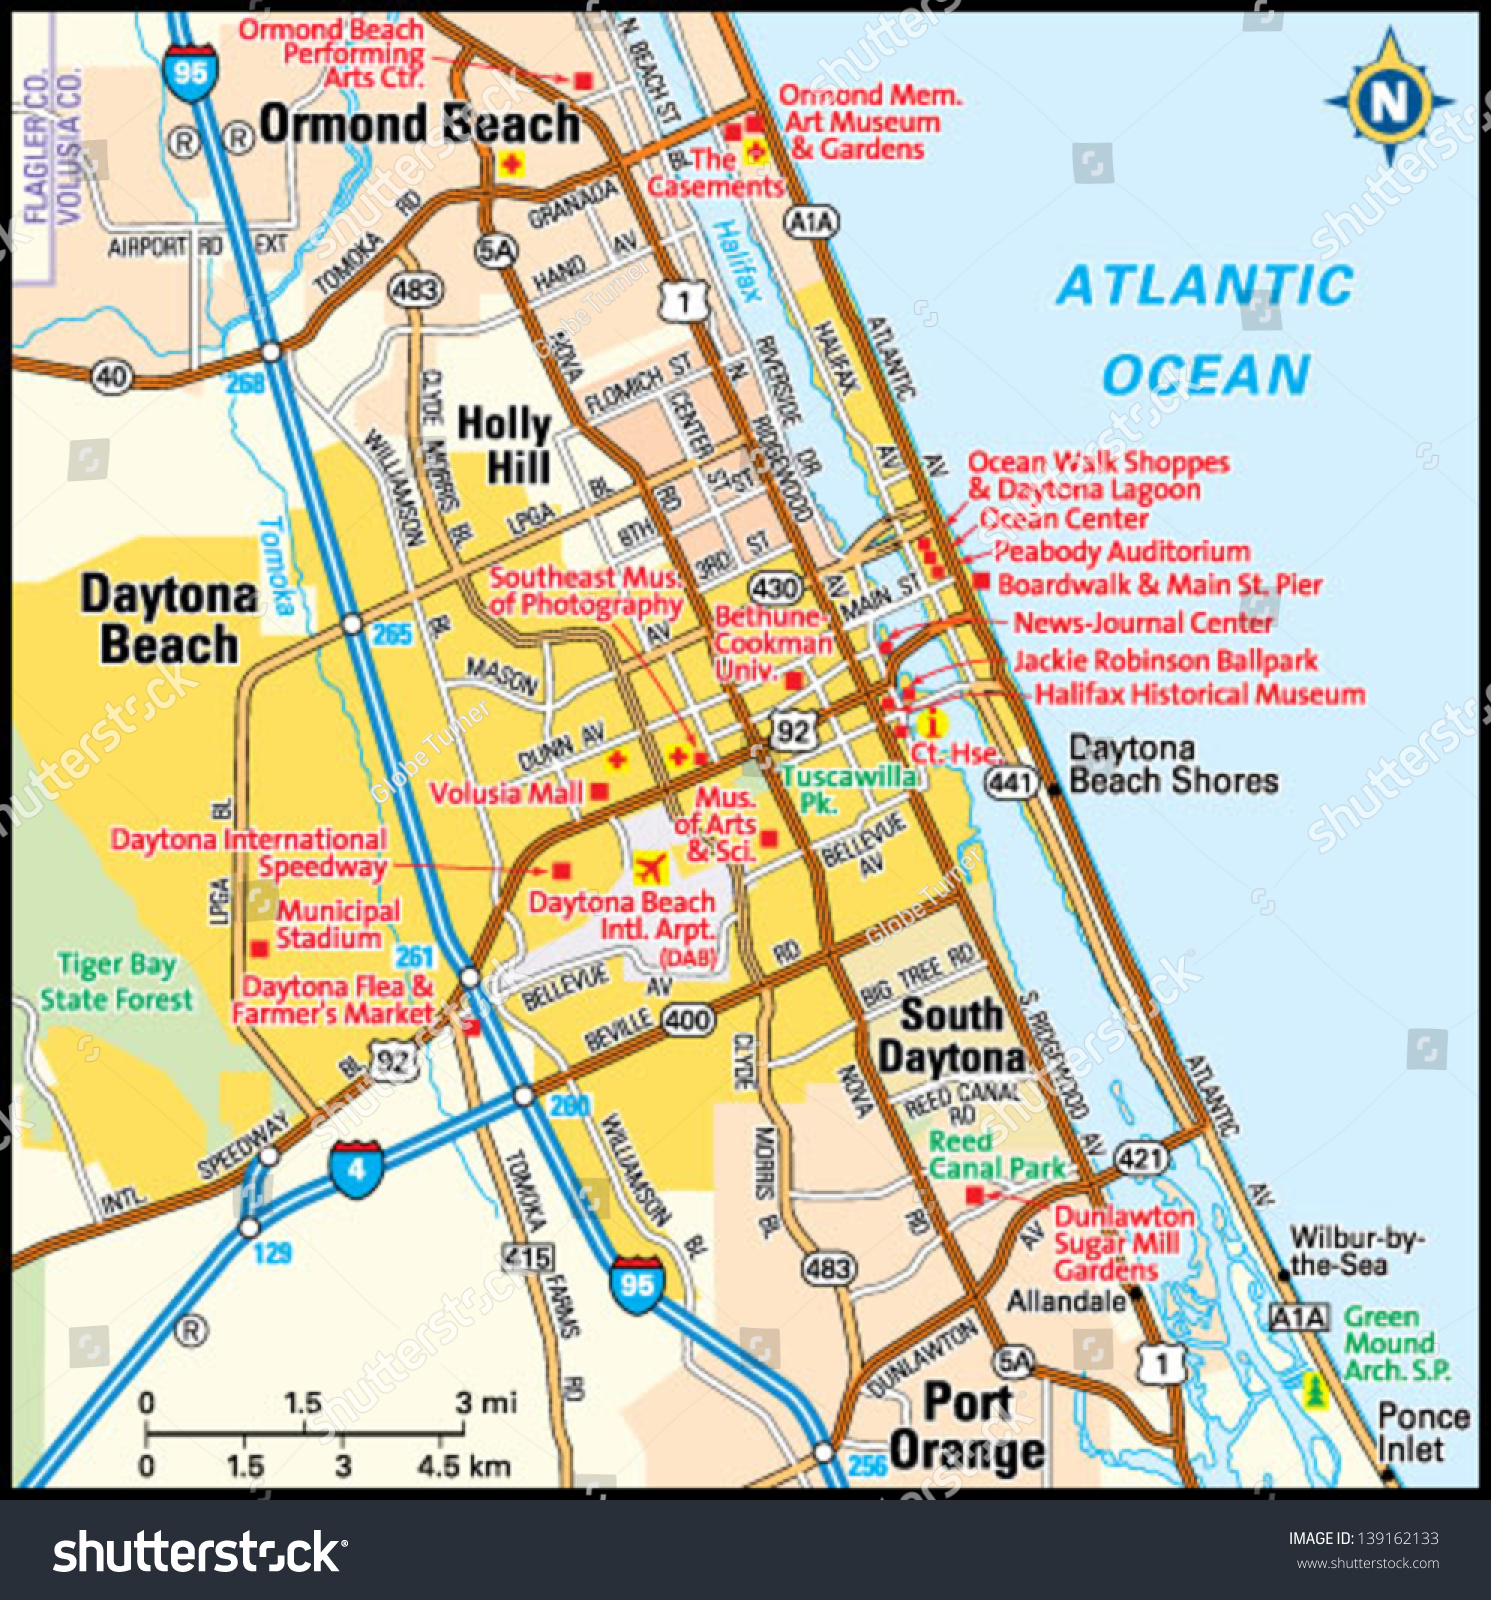 Daytona Beach Florida Area Map Stock Vector  Shutterstock - Florida map daytona area